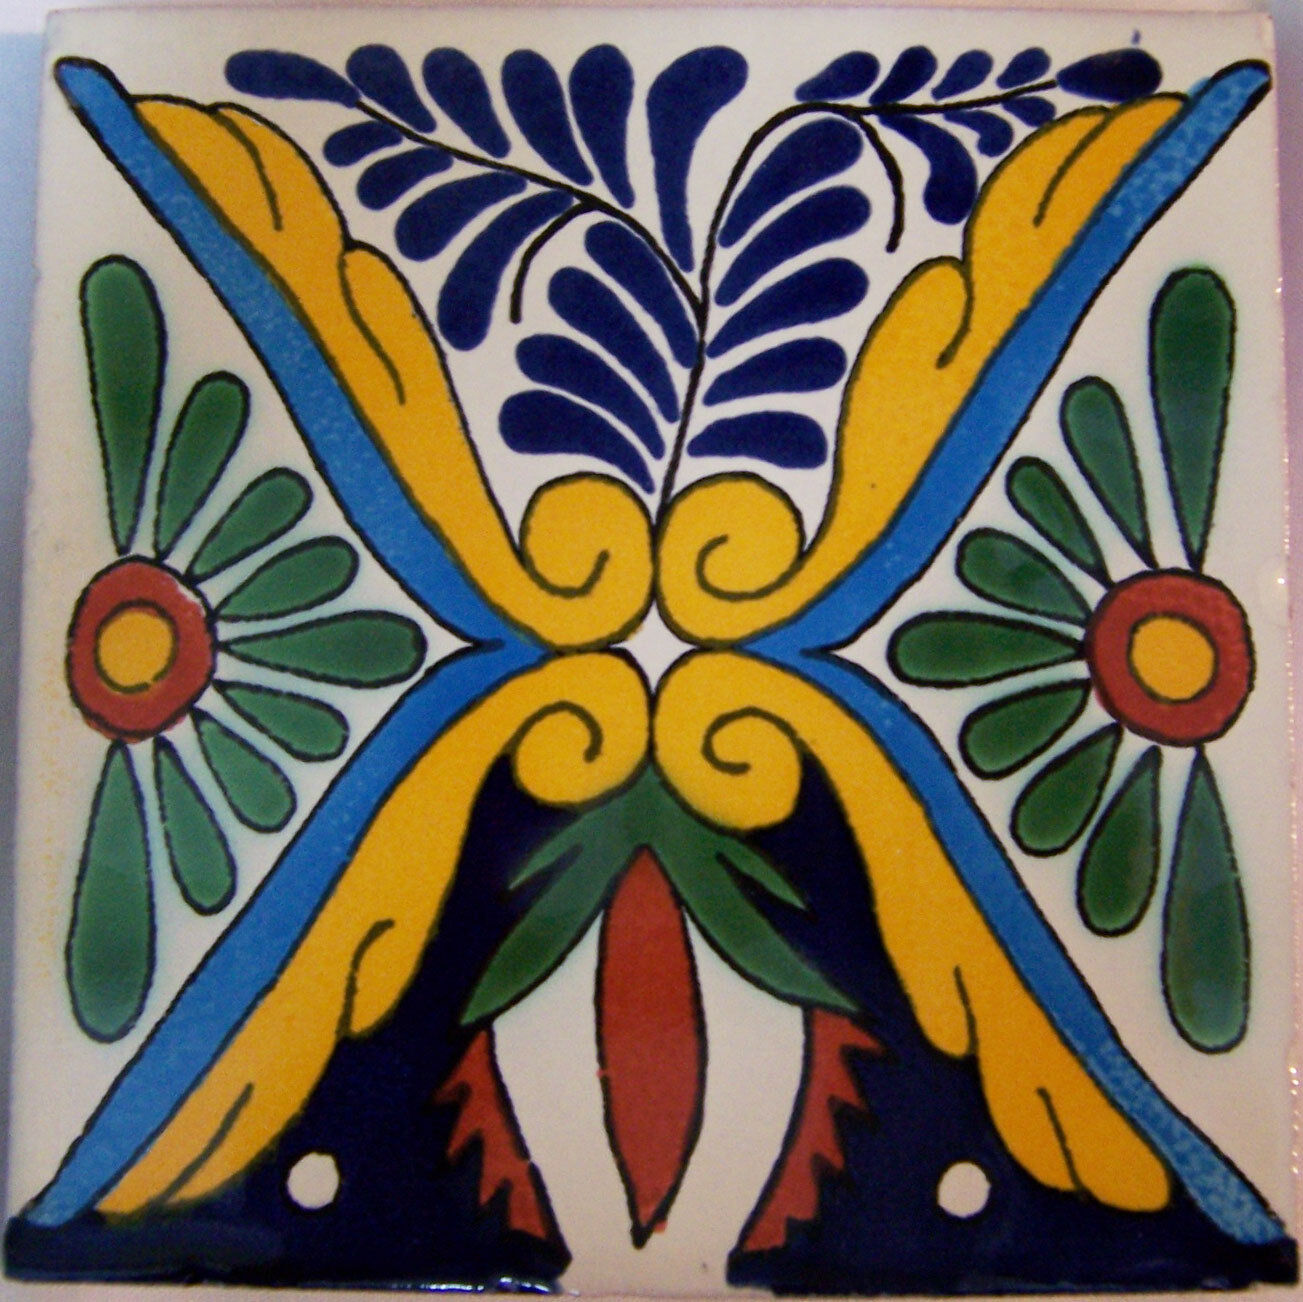 C282- Mexican Handmade Talavera Clay Tile Folk Art 4x4